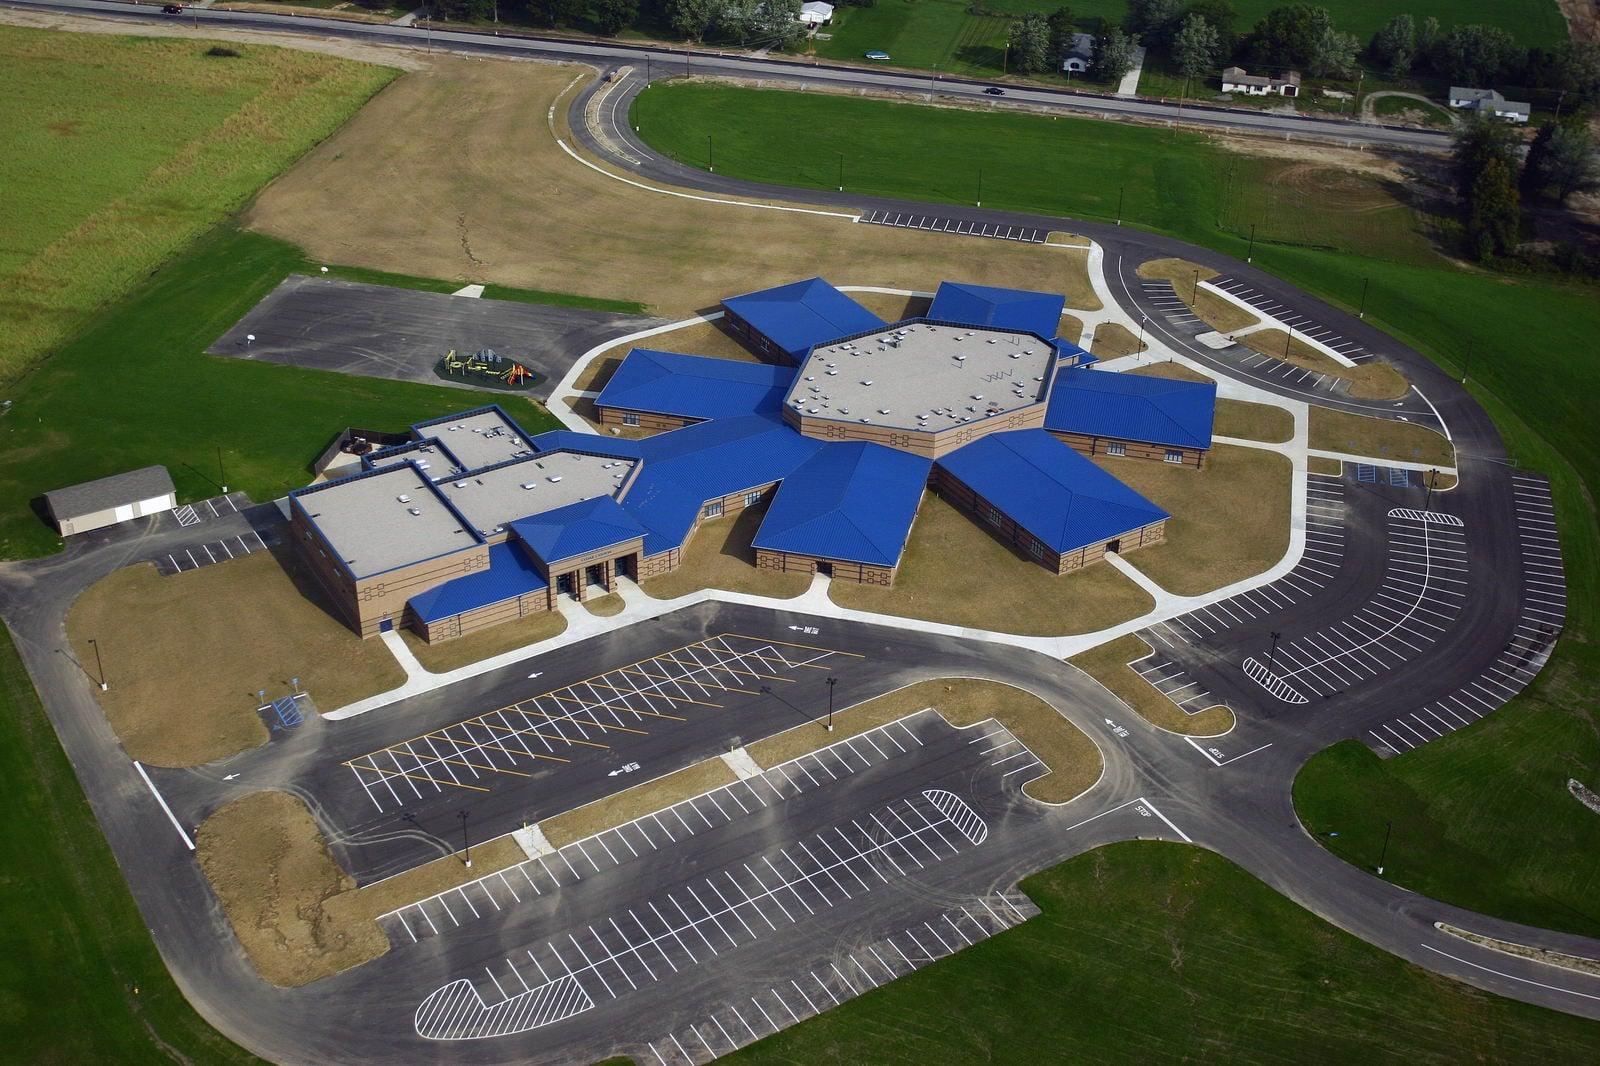 Cedar Canyon Elementary School